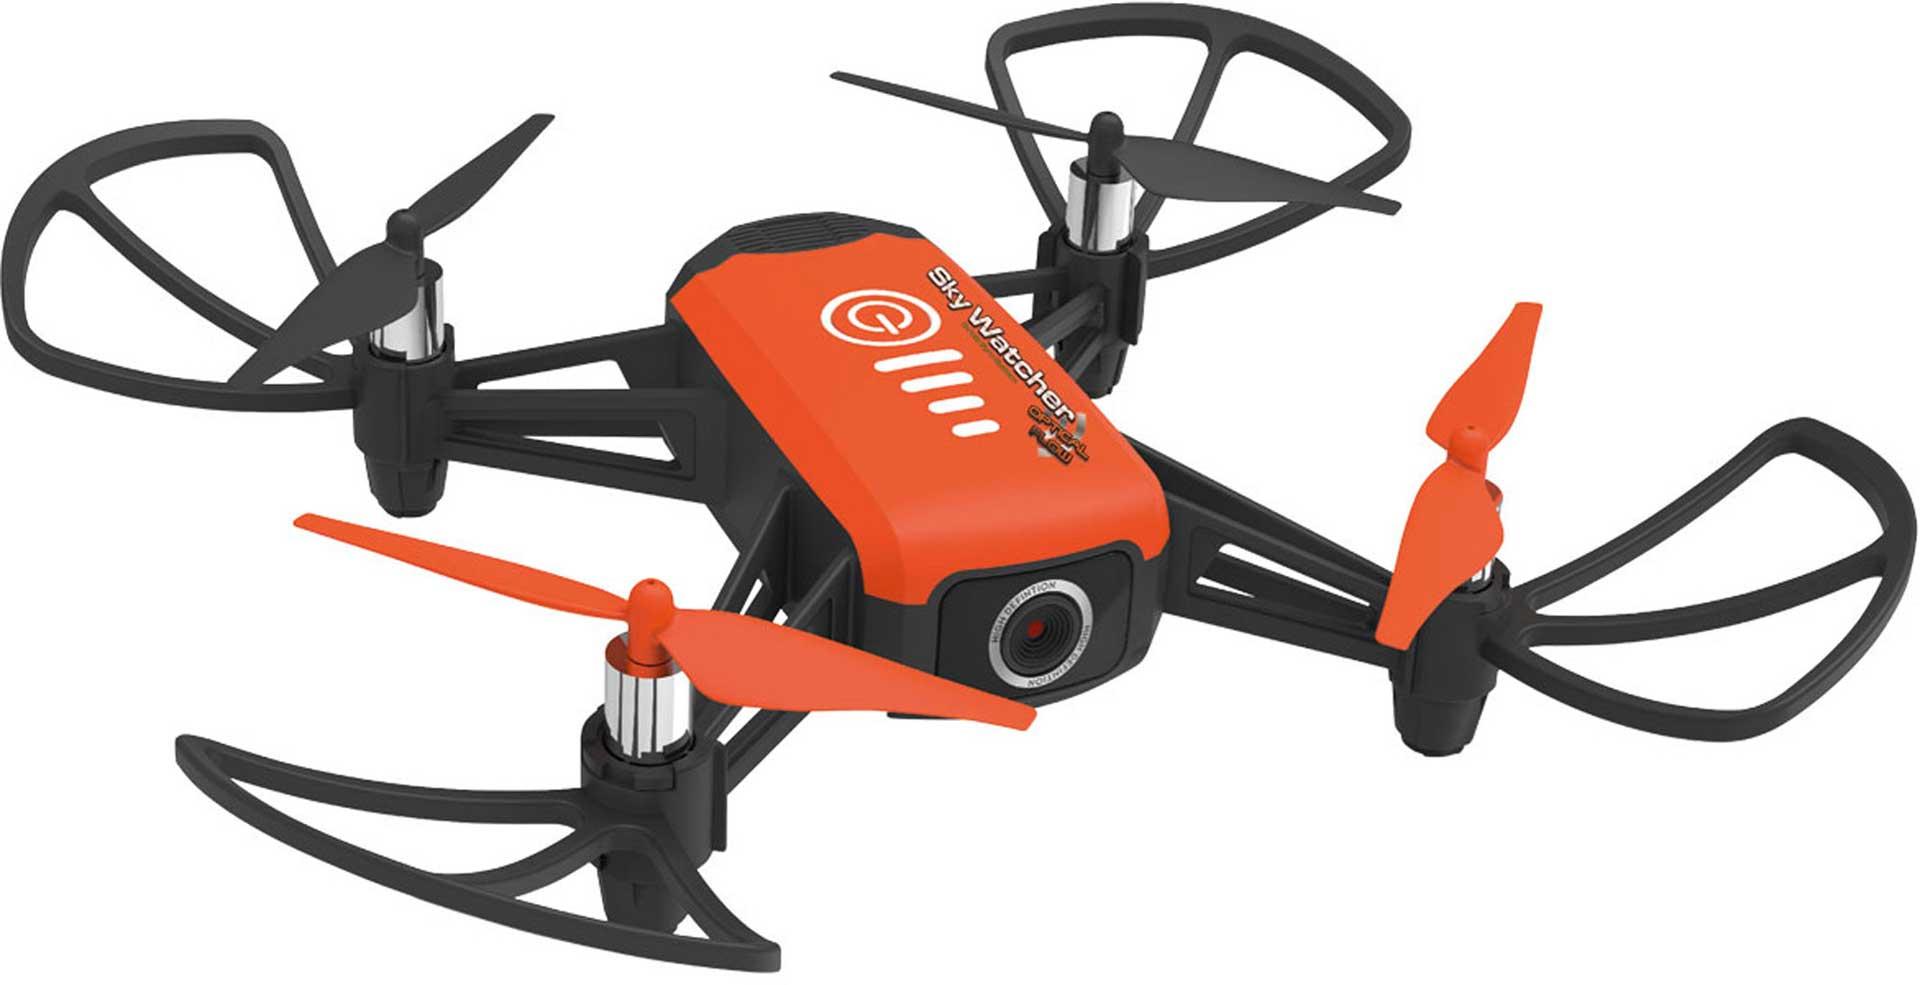 DRIVE & FLY MODELS SKY WATCHER OPTICAL FLOW RTF & FPV